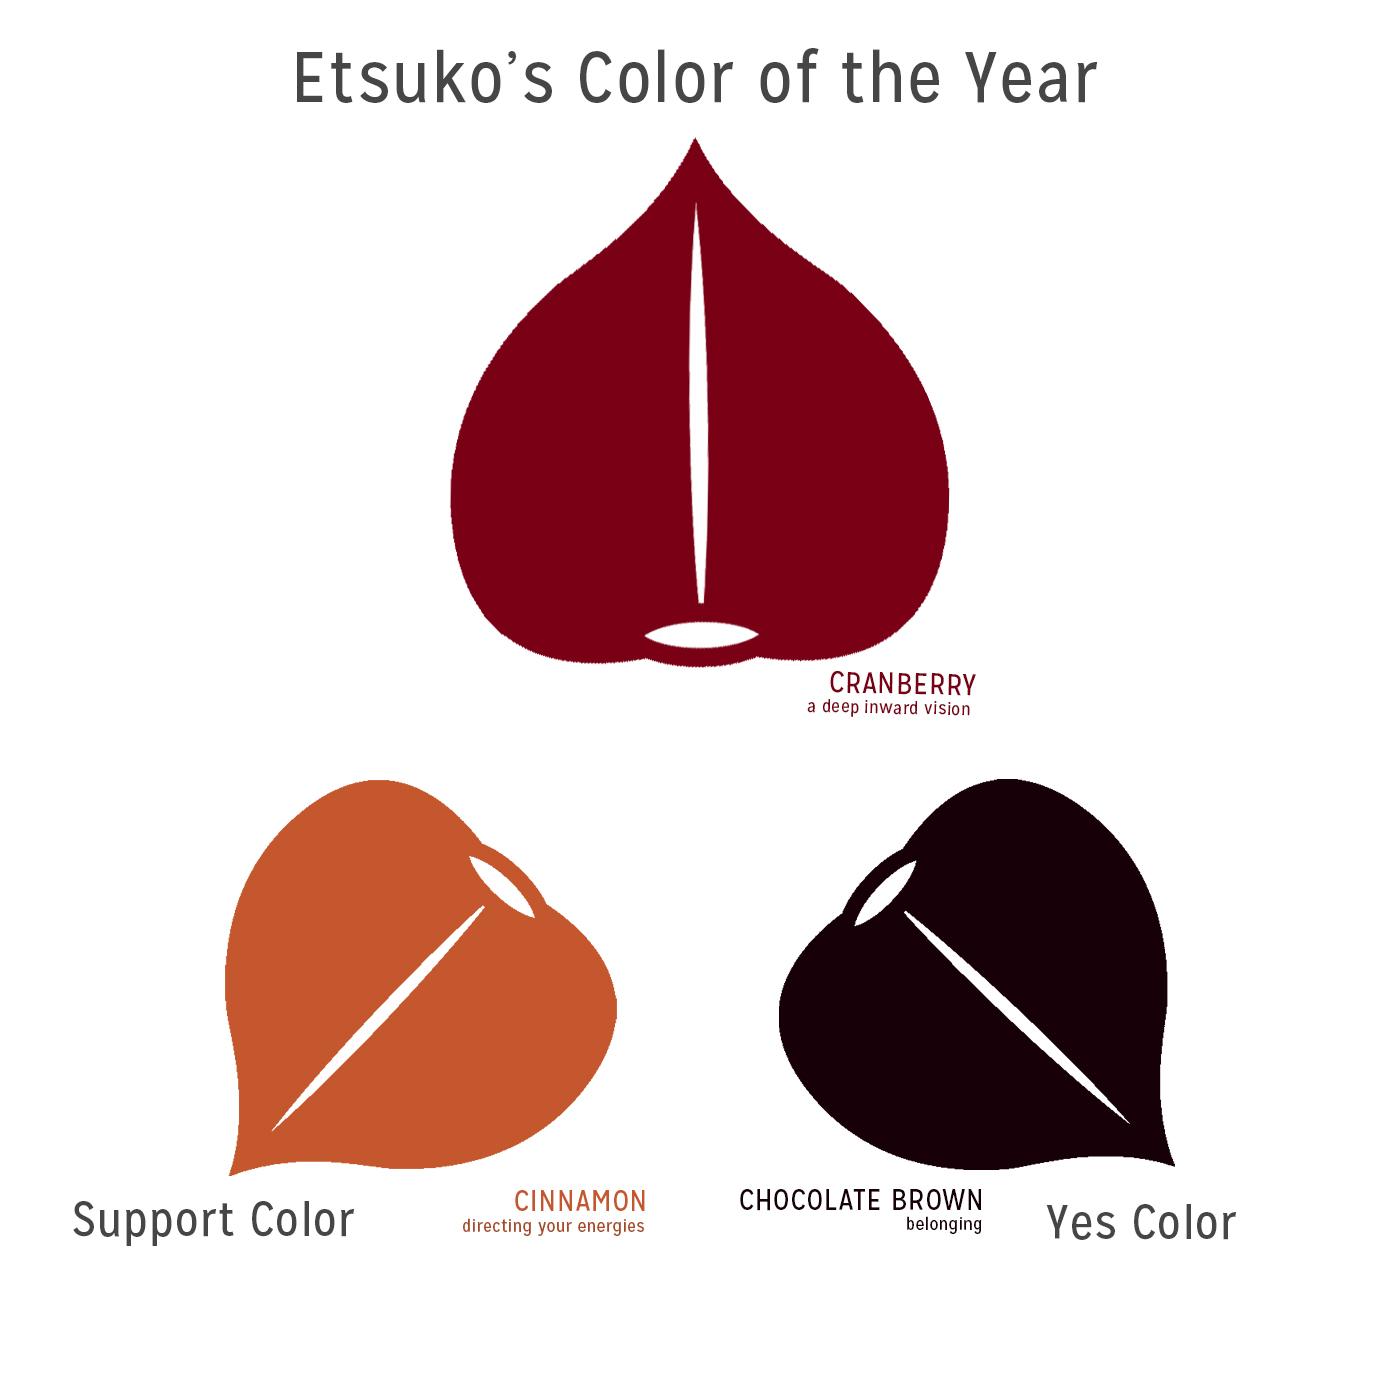 etsuko